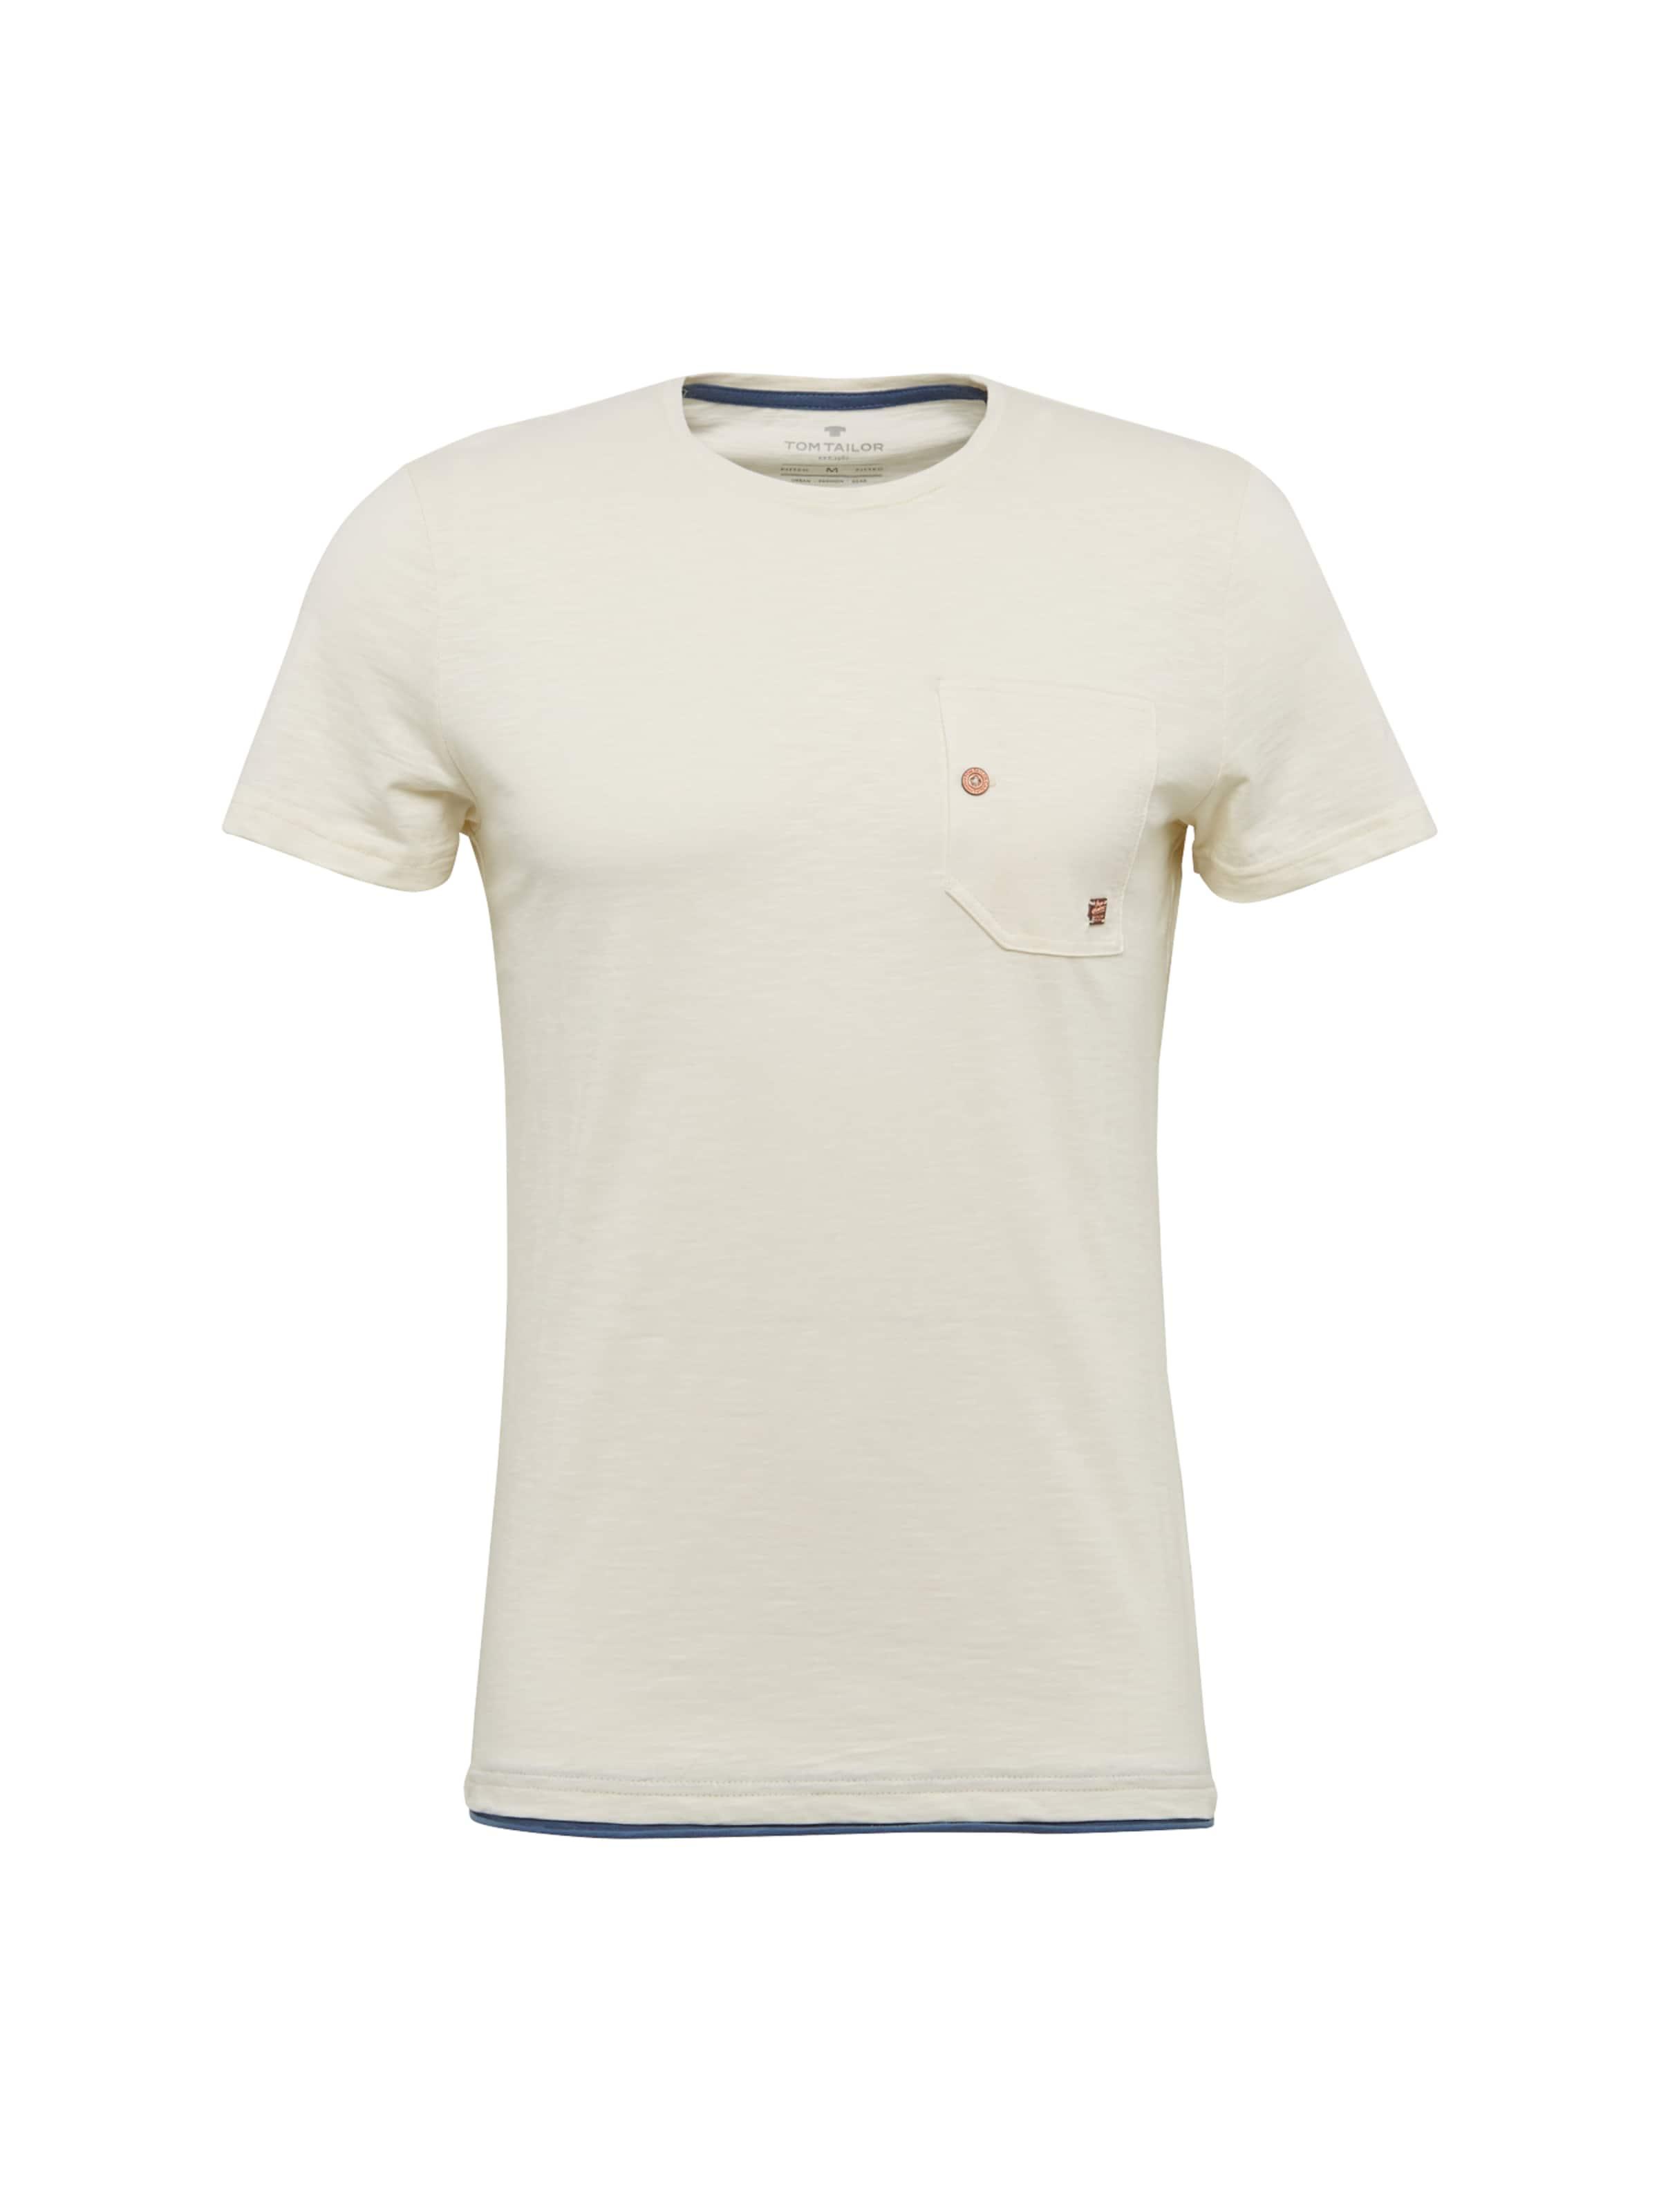 En Blanc Tailor T shirt Tom Tee' 'layering rCtdshQ